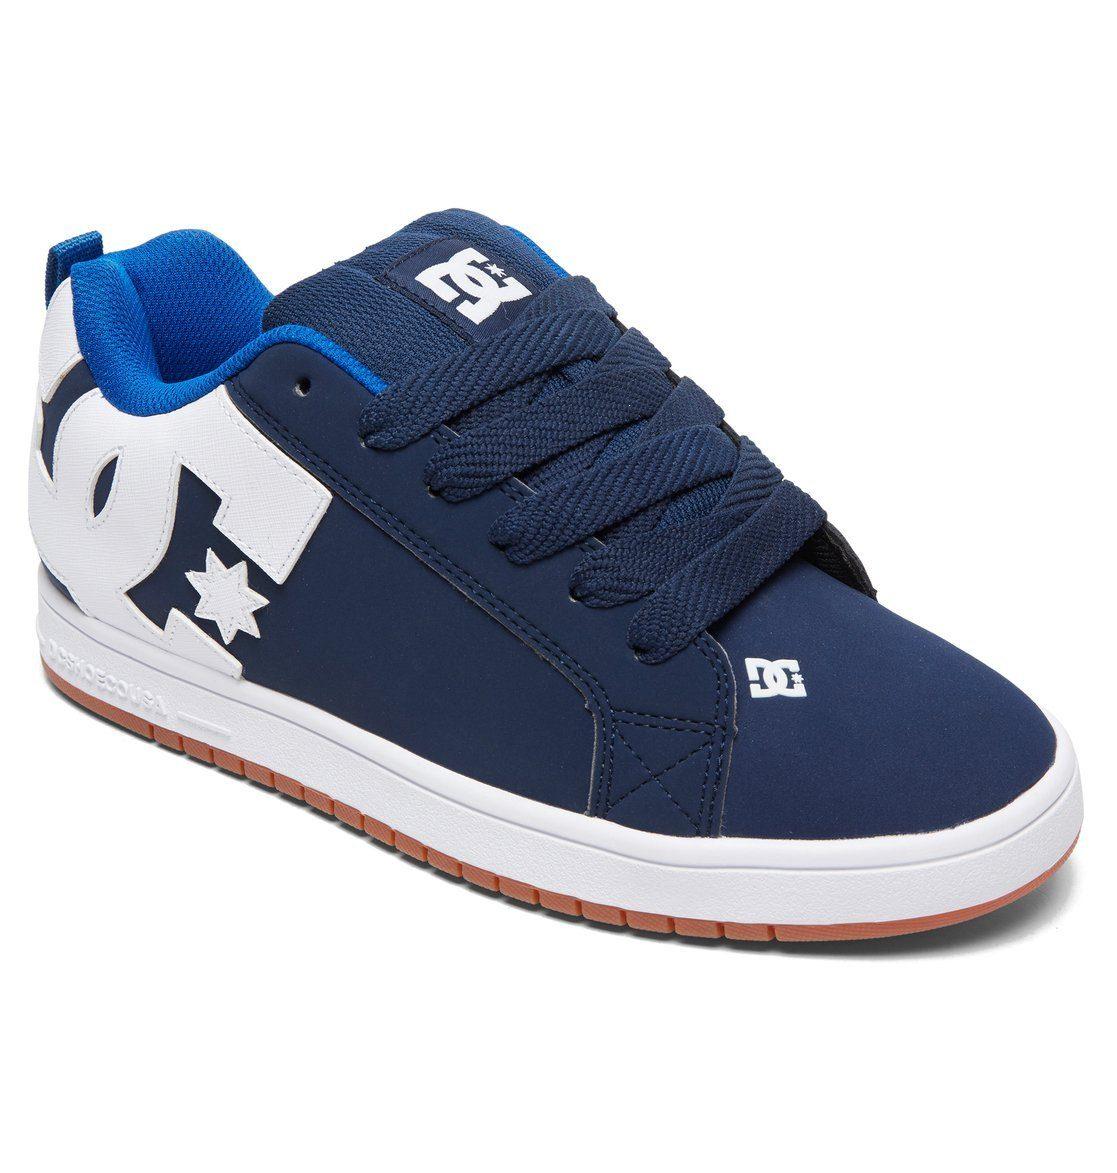 Wildlederobermaterial Graffik Kaufen Schuhe oder Artikel Dc nr Court 5708380799 Und Navy Nubukleder Leder Online Shoes tgnxwSqA8